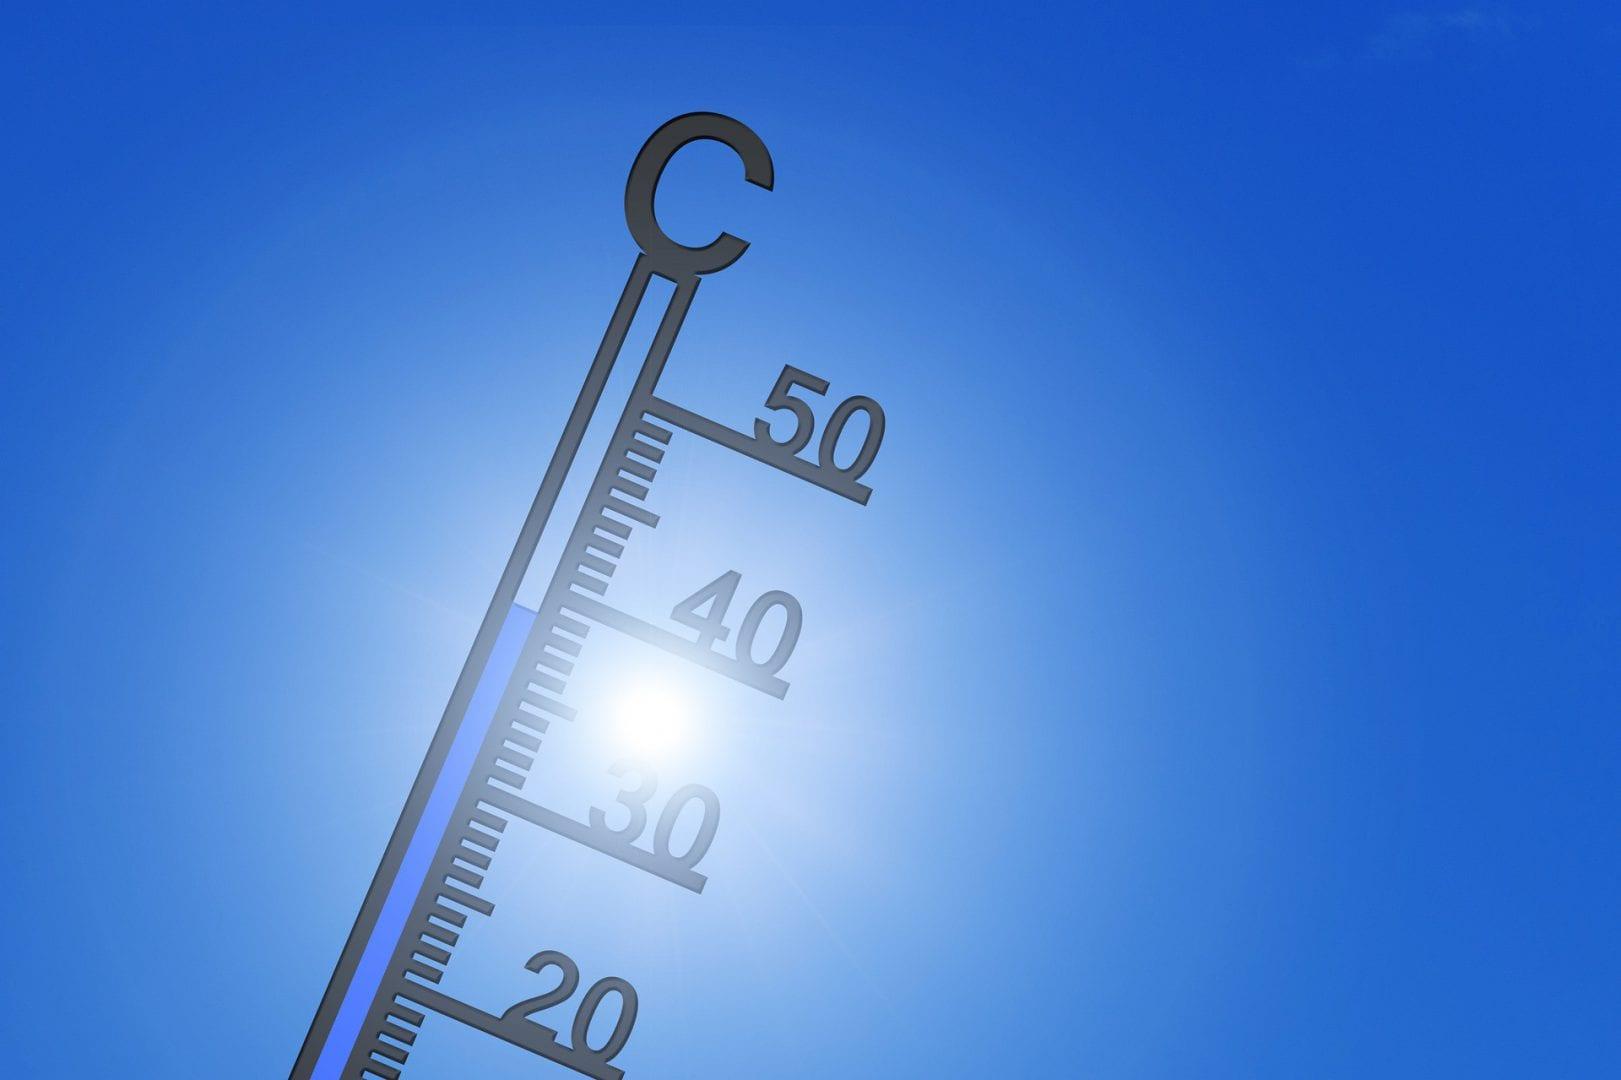 Hitzewelle lässt Stromverbrauch steigen